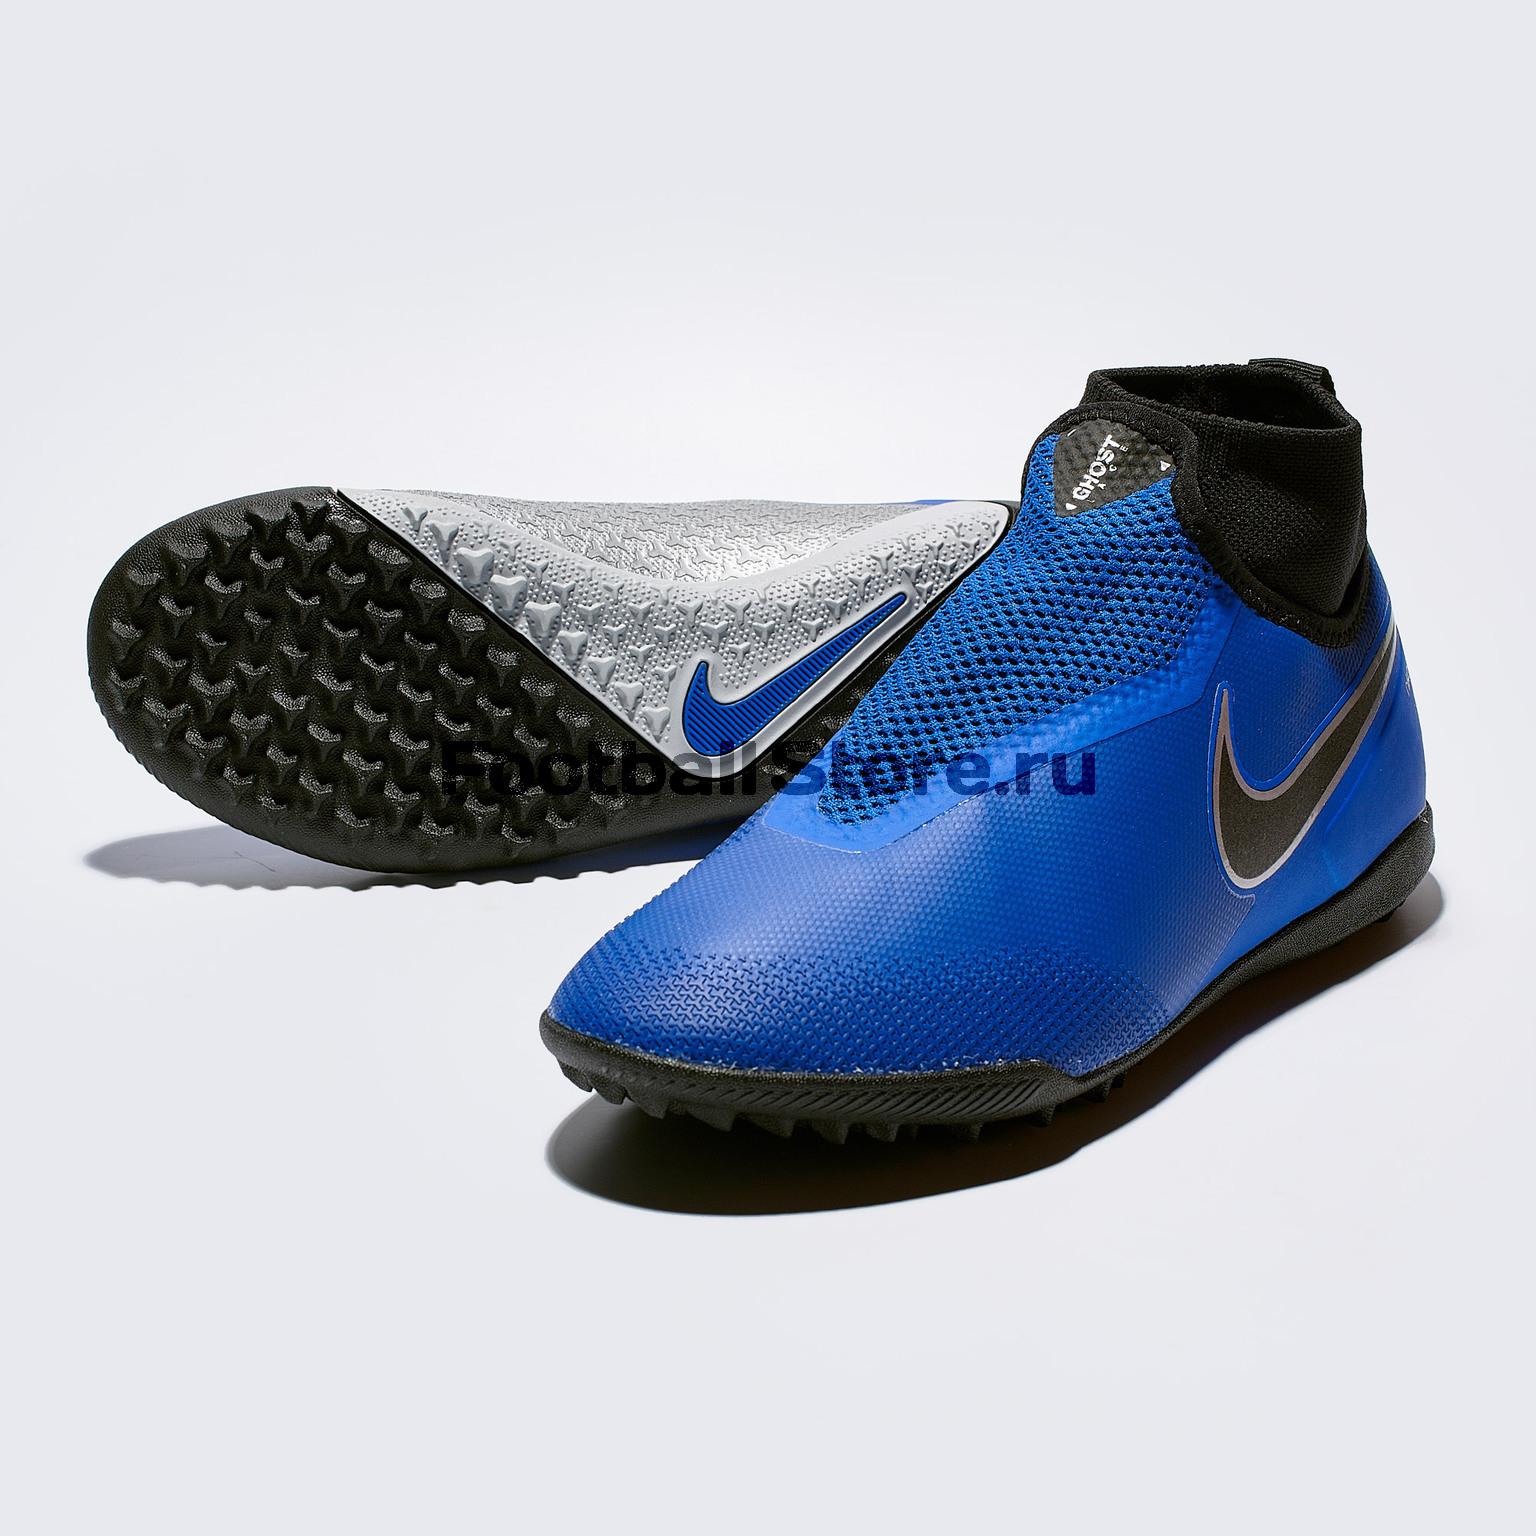 dc271233 Шиповки Nike React Phantom Vision Pro DF TF AO3277-400 – купить ...